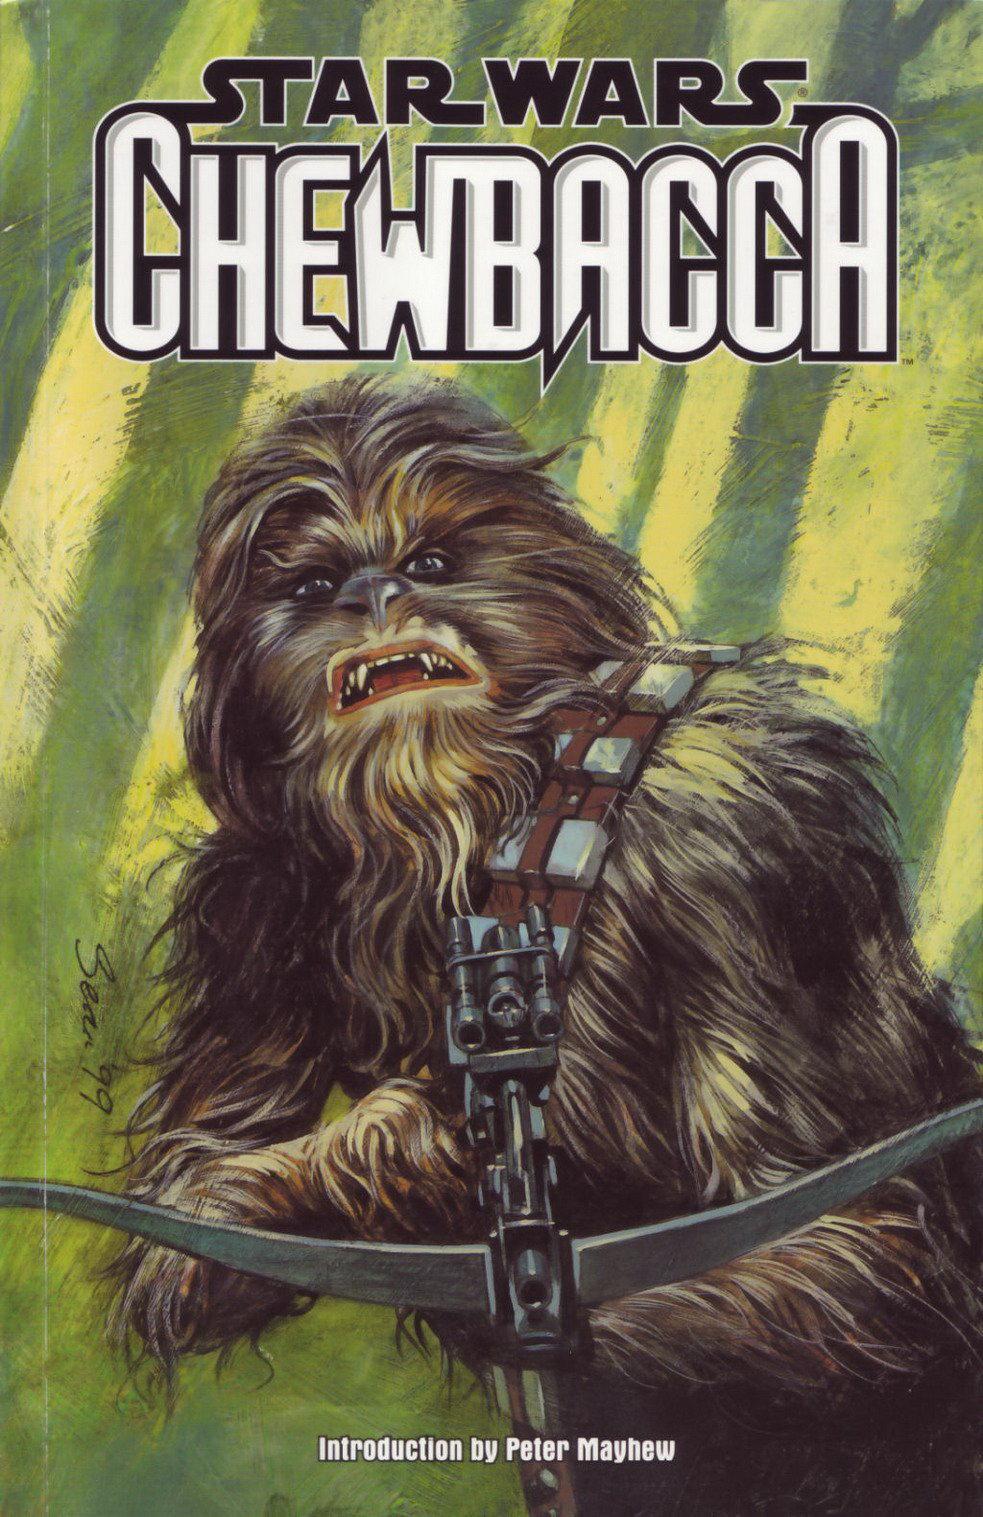 Star Wars   Chewbacca (Dark Horse 2001)   TPB preview 0